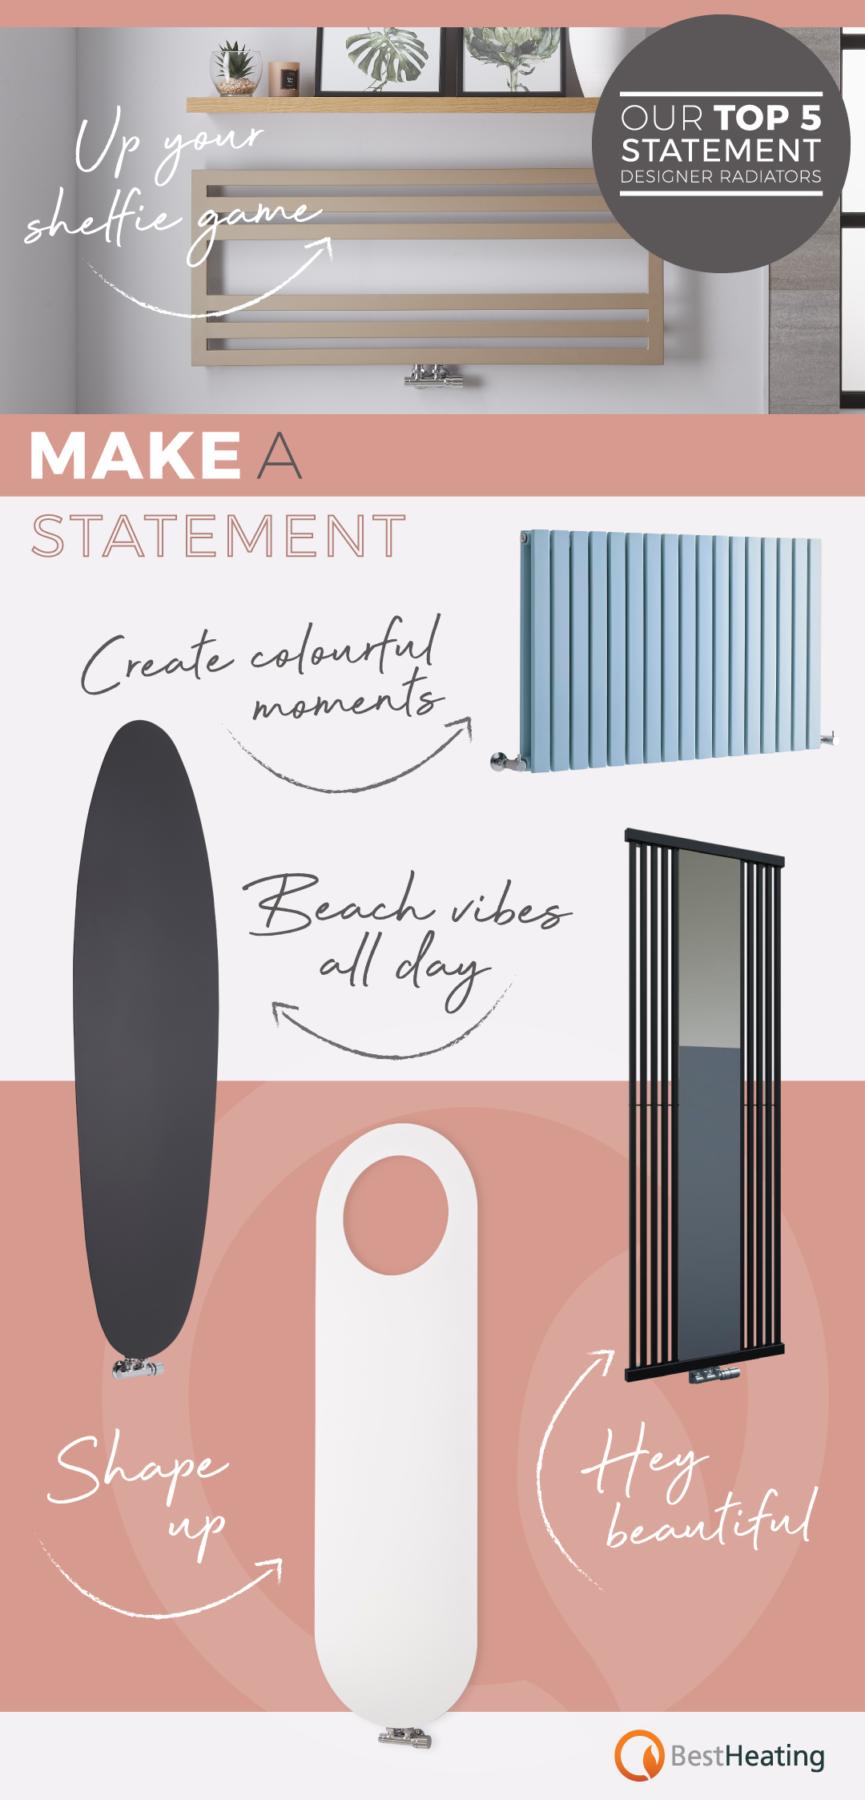 Top 5 statement designer radiator banner